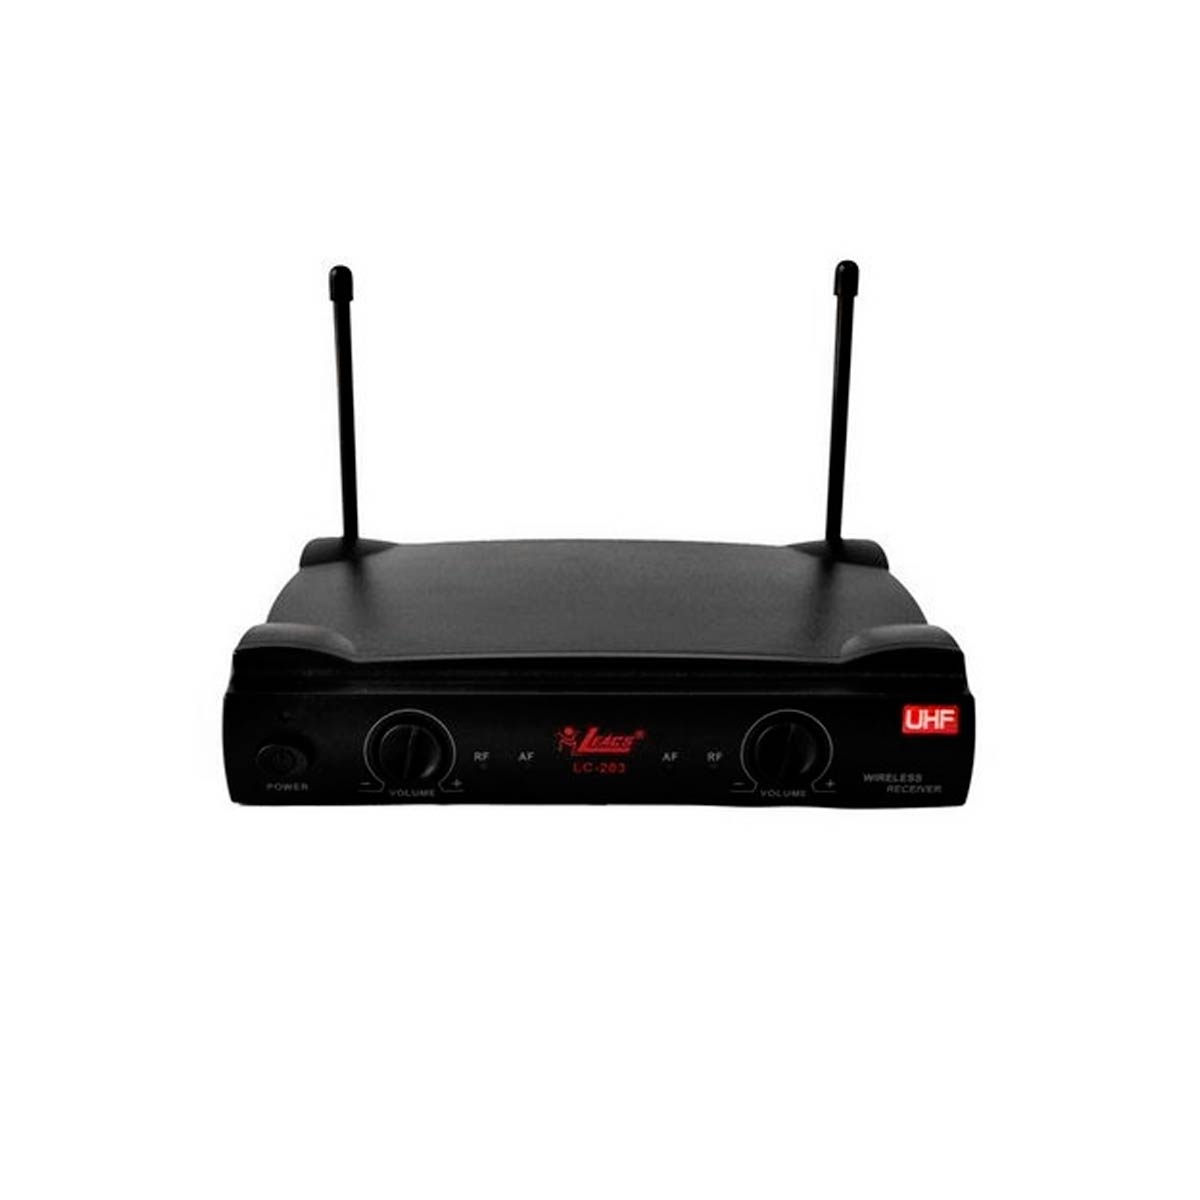 LC203 - Microfone s/ Fio Mão, Headset e Lapela LC 203 - Leacs